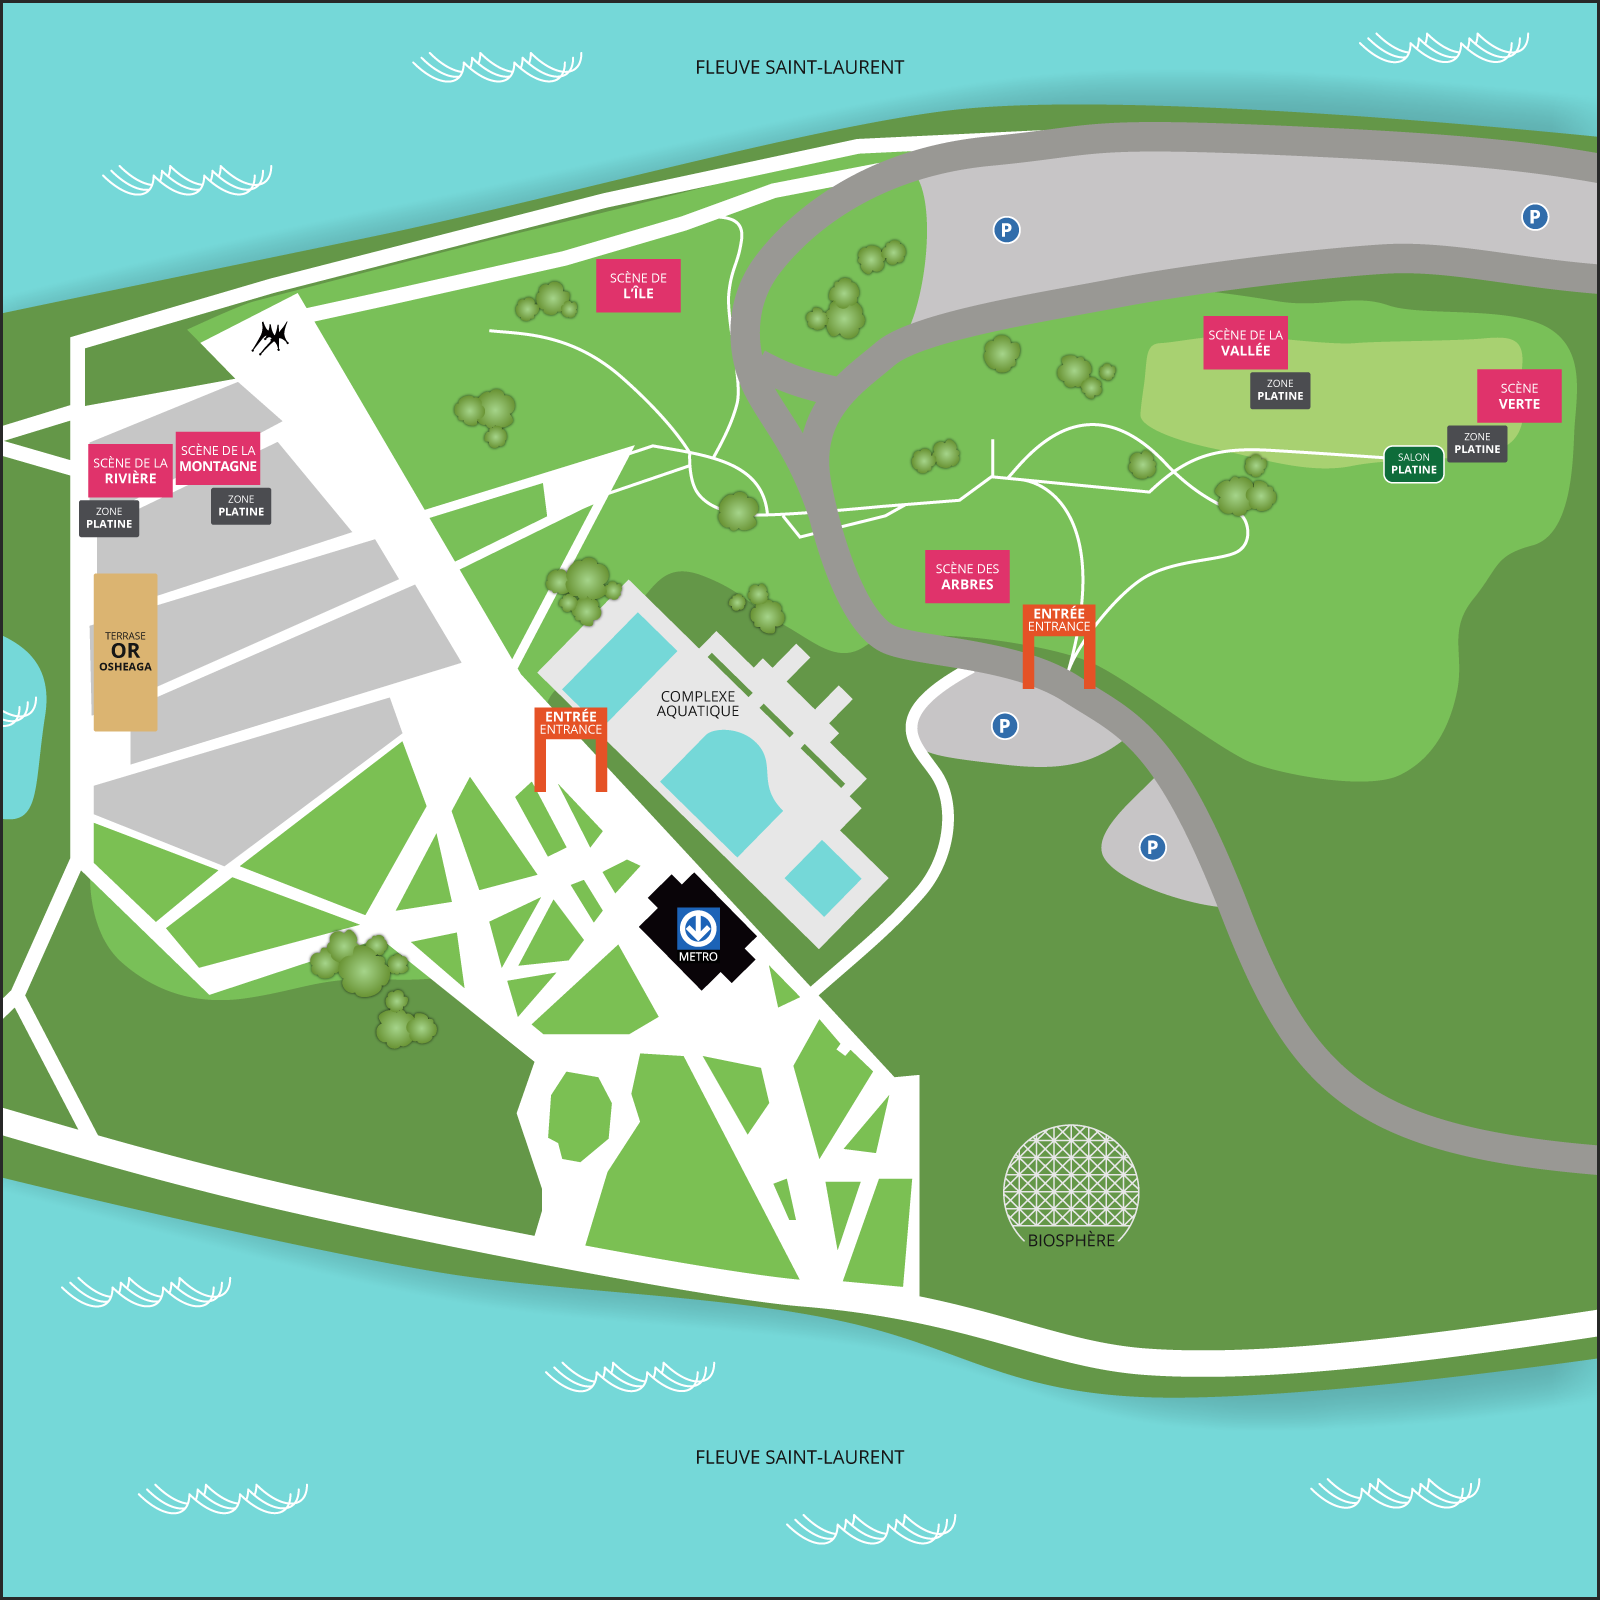 îleSoniq 2020 - 2 Day Pass - Deadmau5, Tiësto, DJ Snake